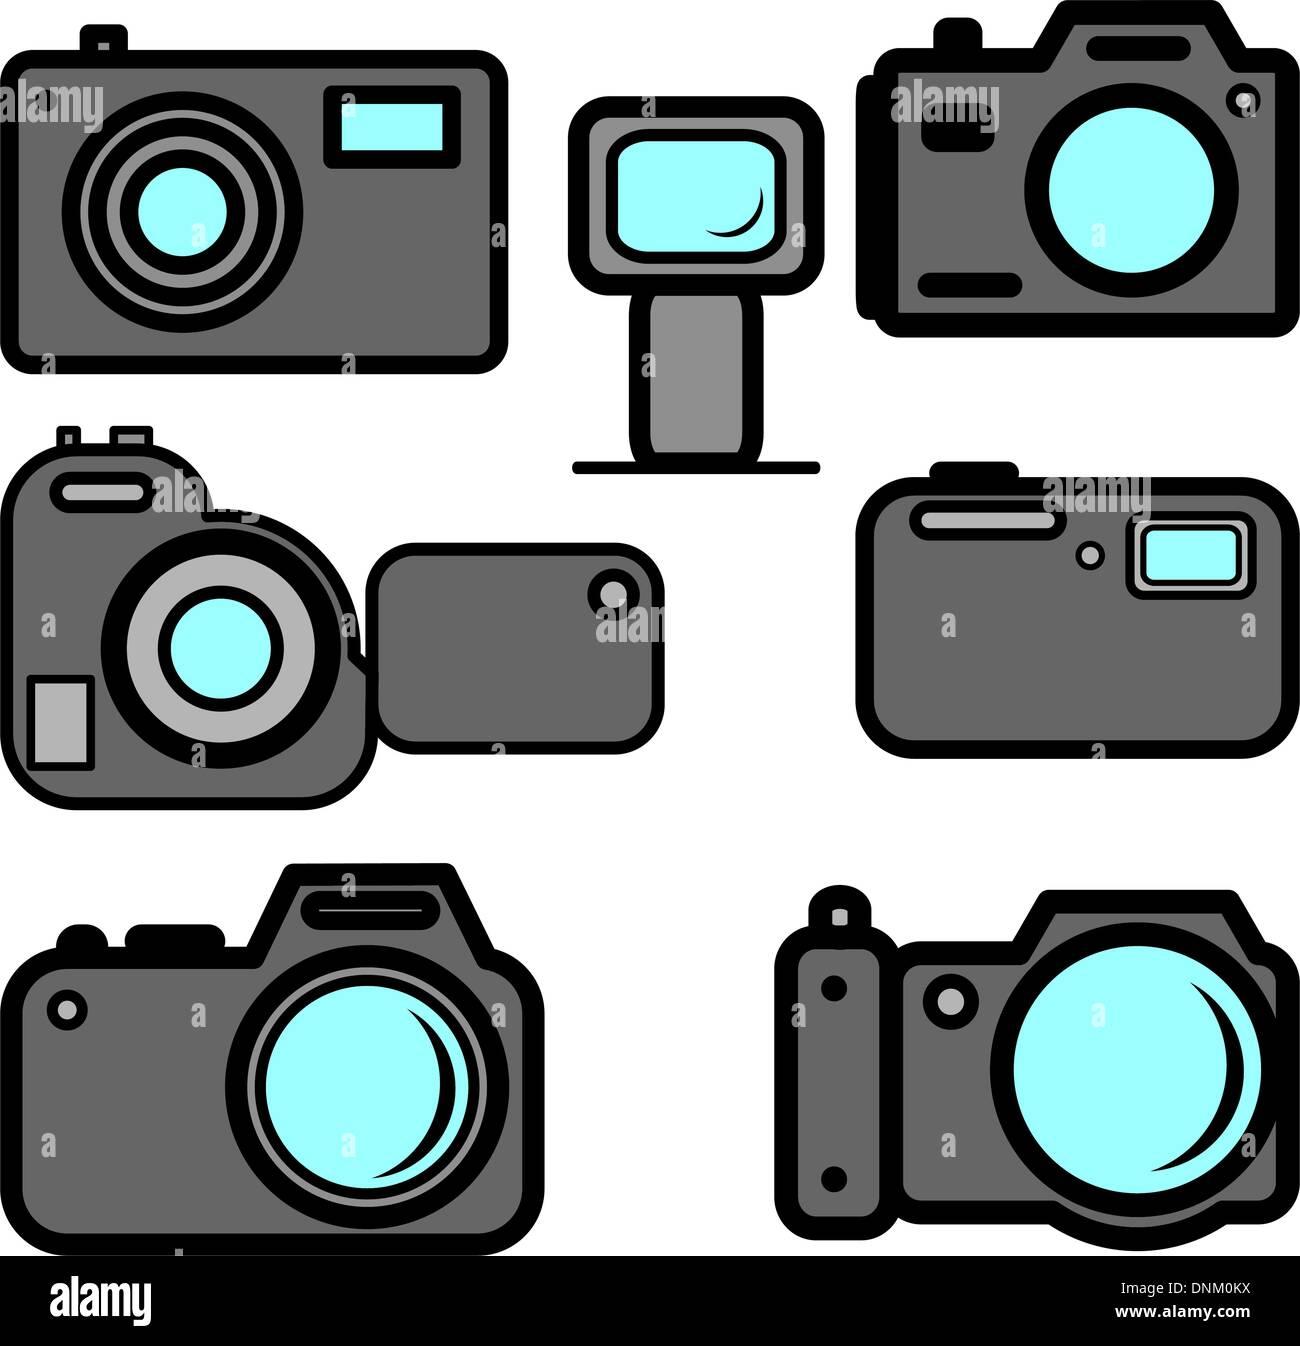 Una serie di telecamere digitali Immagini Stock